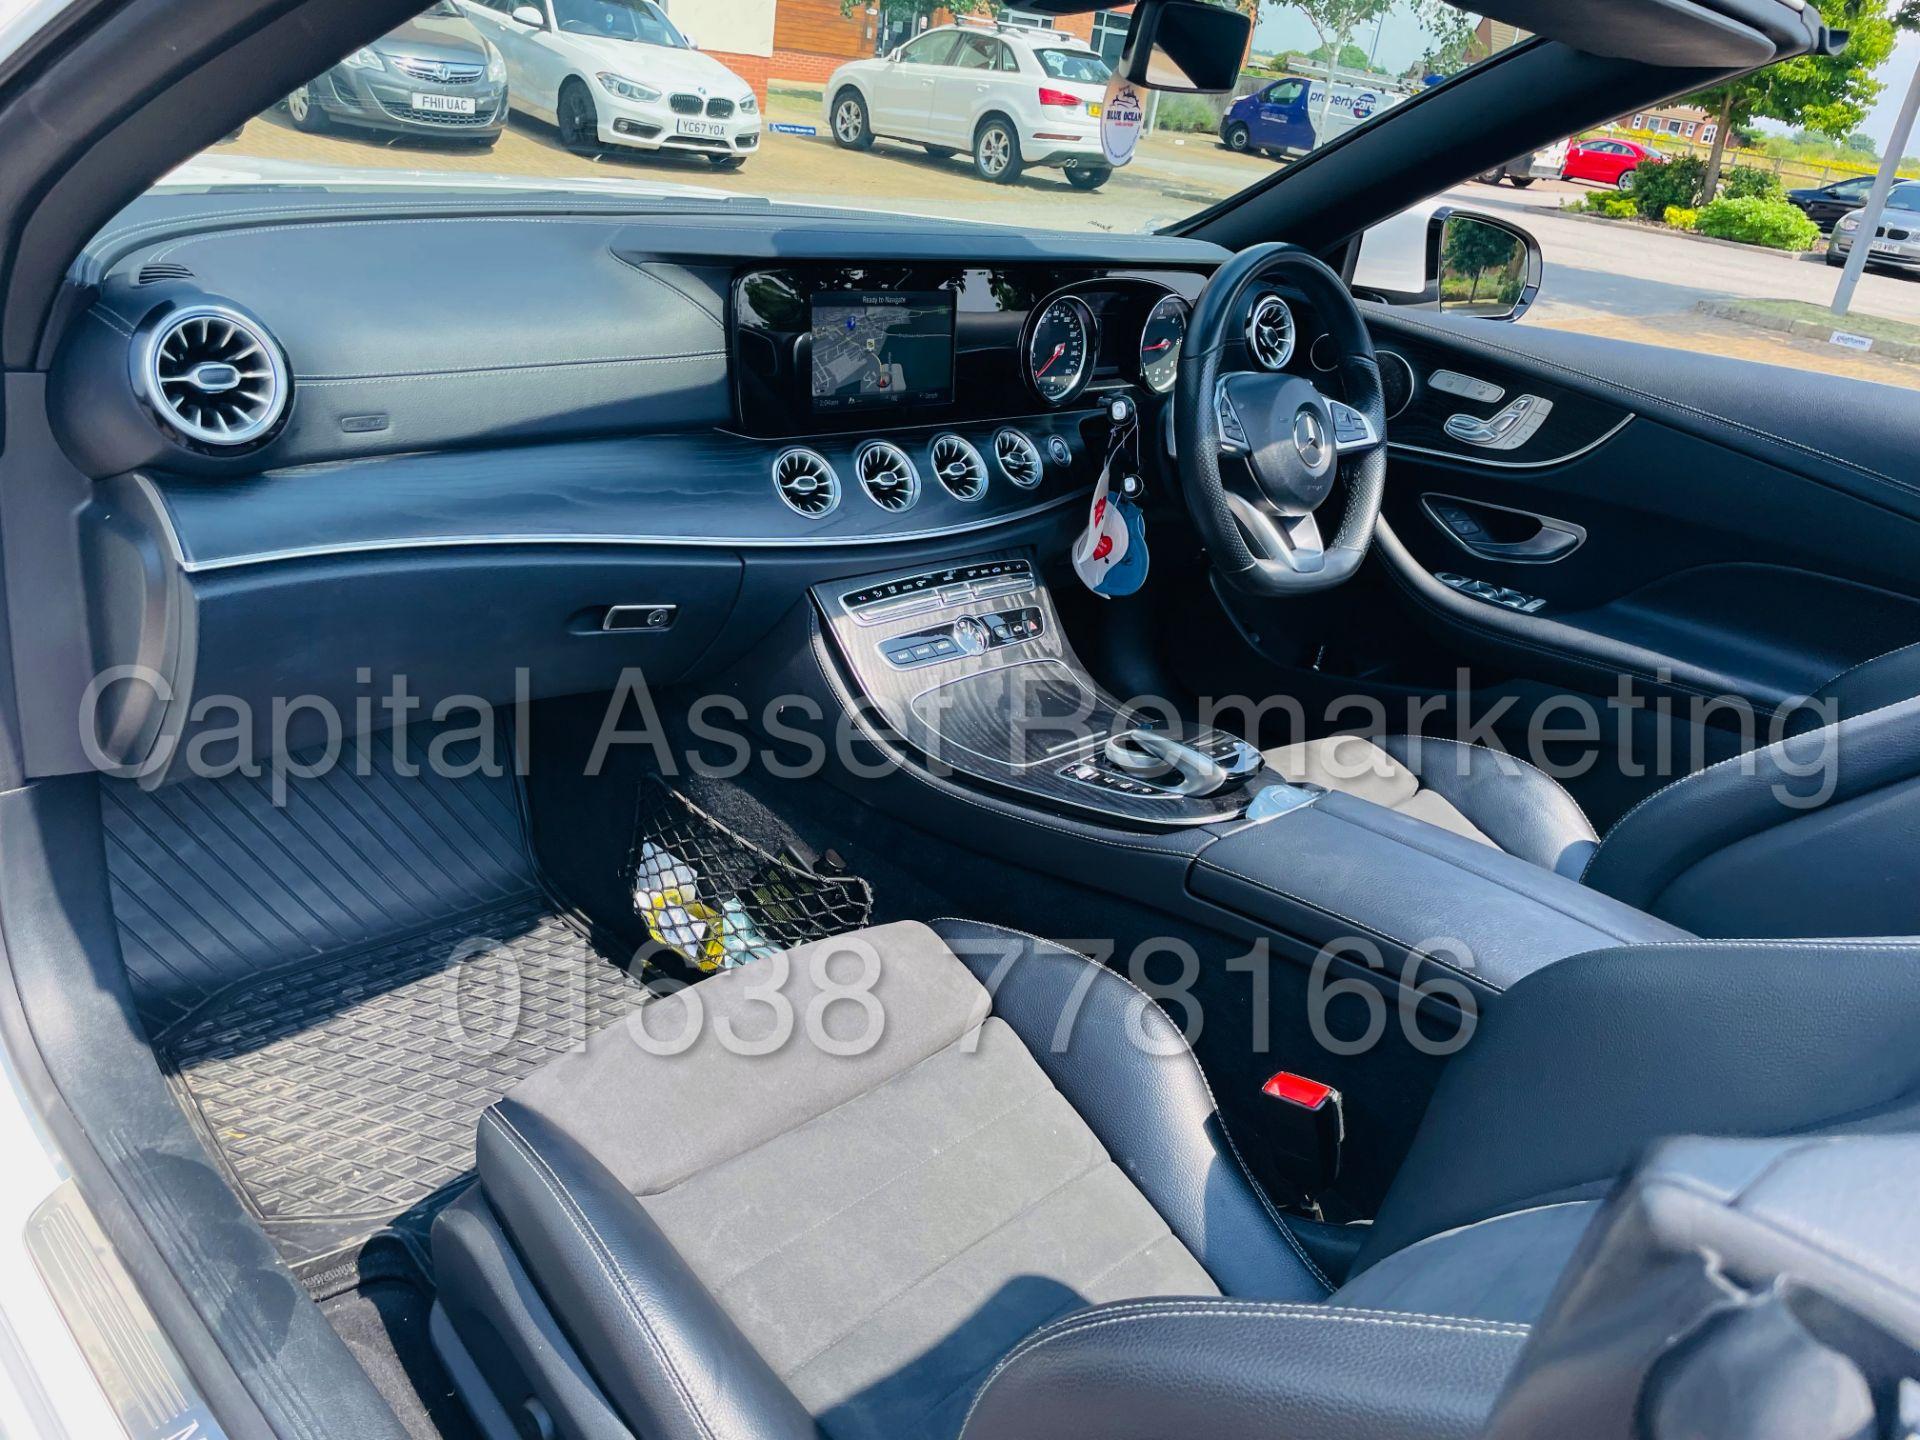 MERCEDES-BENZ E220d *AMG LINE PREMIUM - CABRIOLET* (2018 - EURO 6) '9G AUTO - LEATHER - SAT NAV' - Image 37 of 63